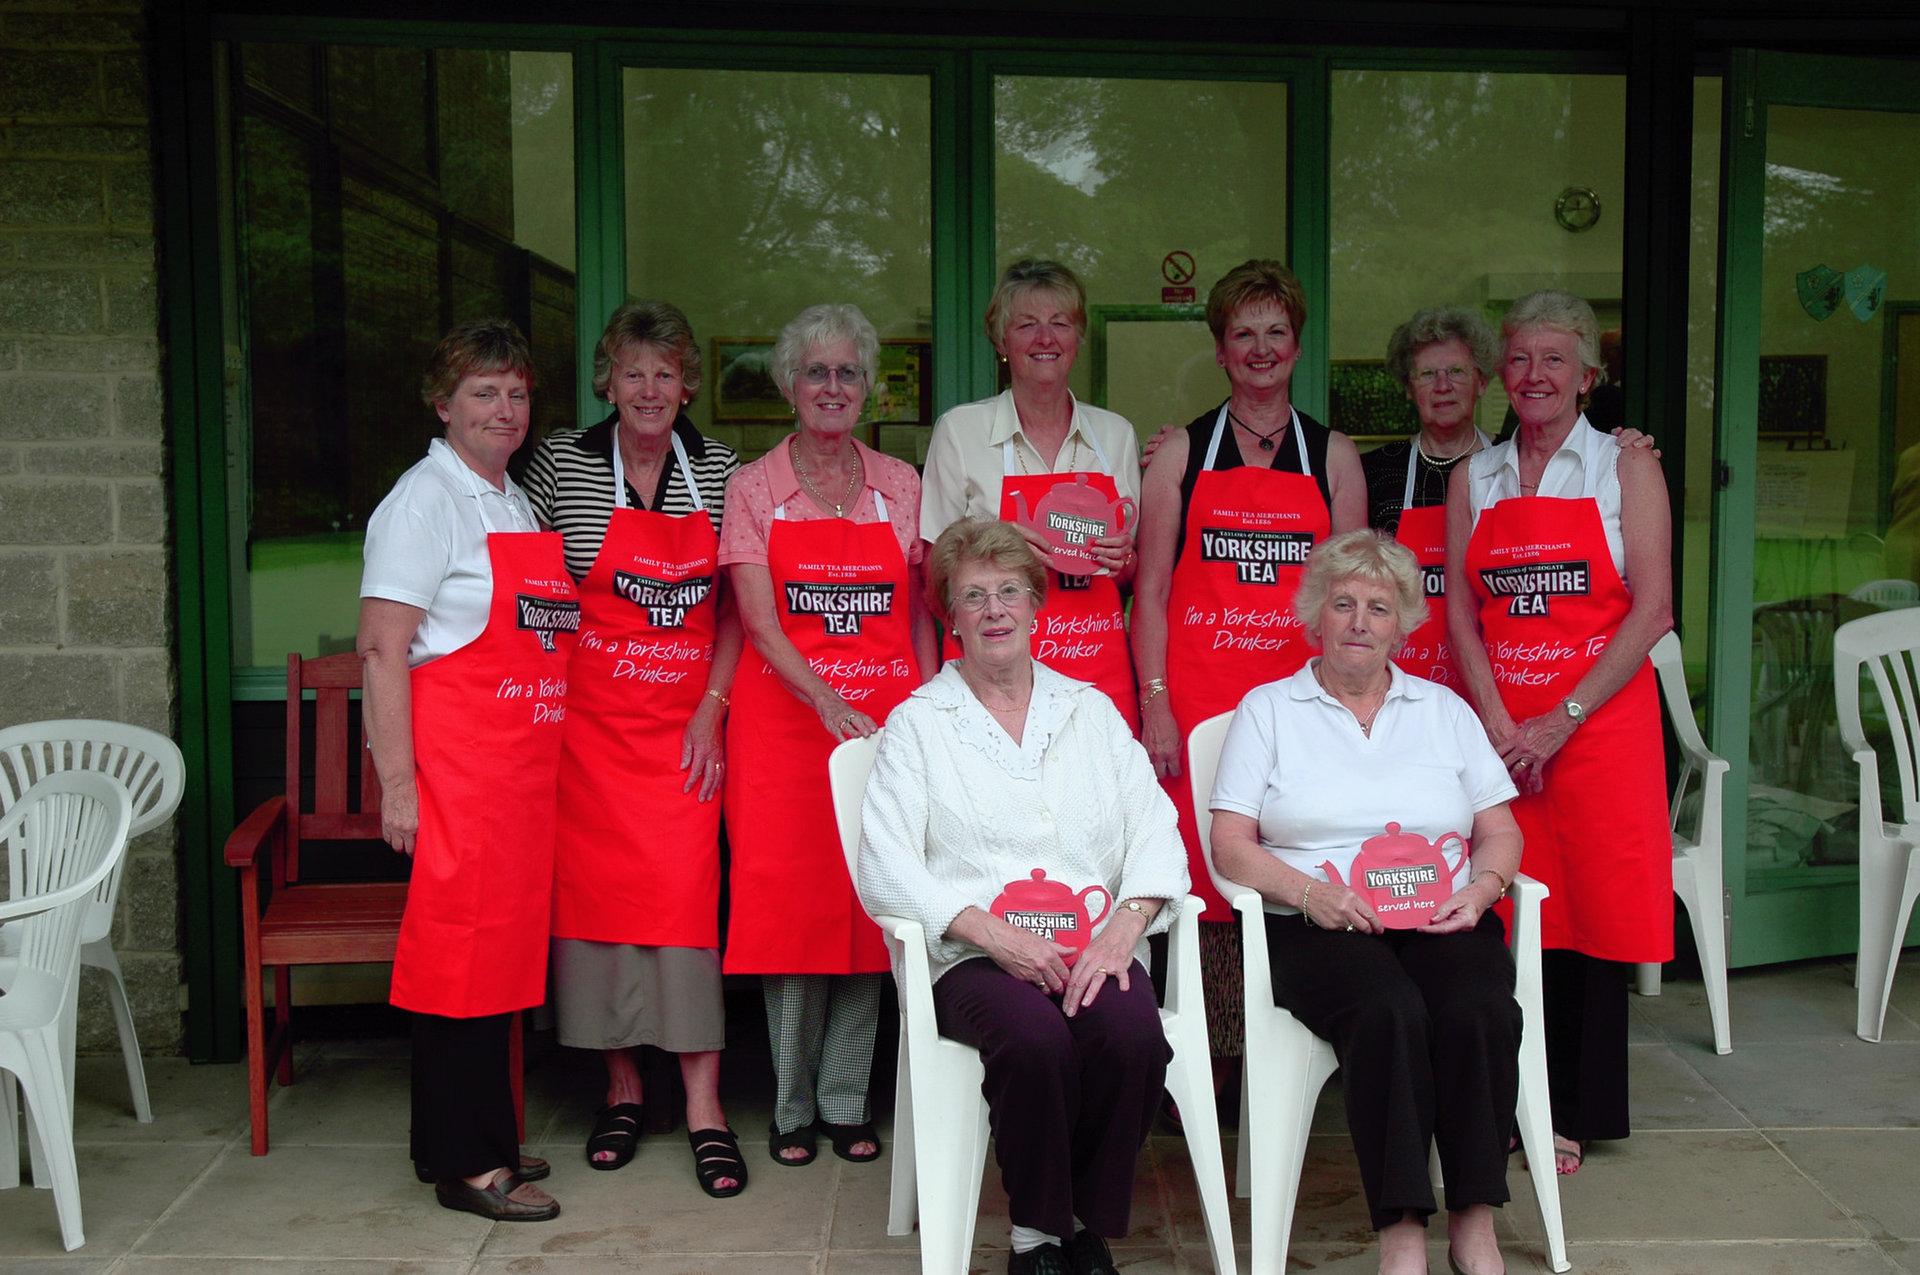 Yorkshire Tea 2006